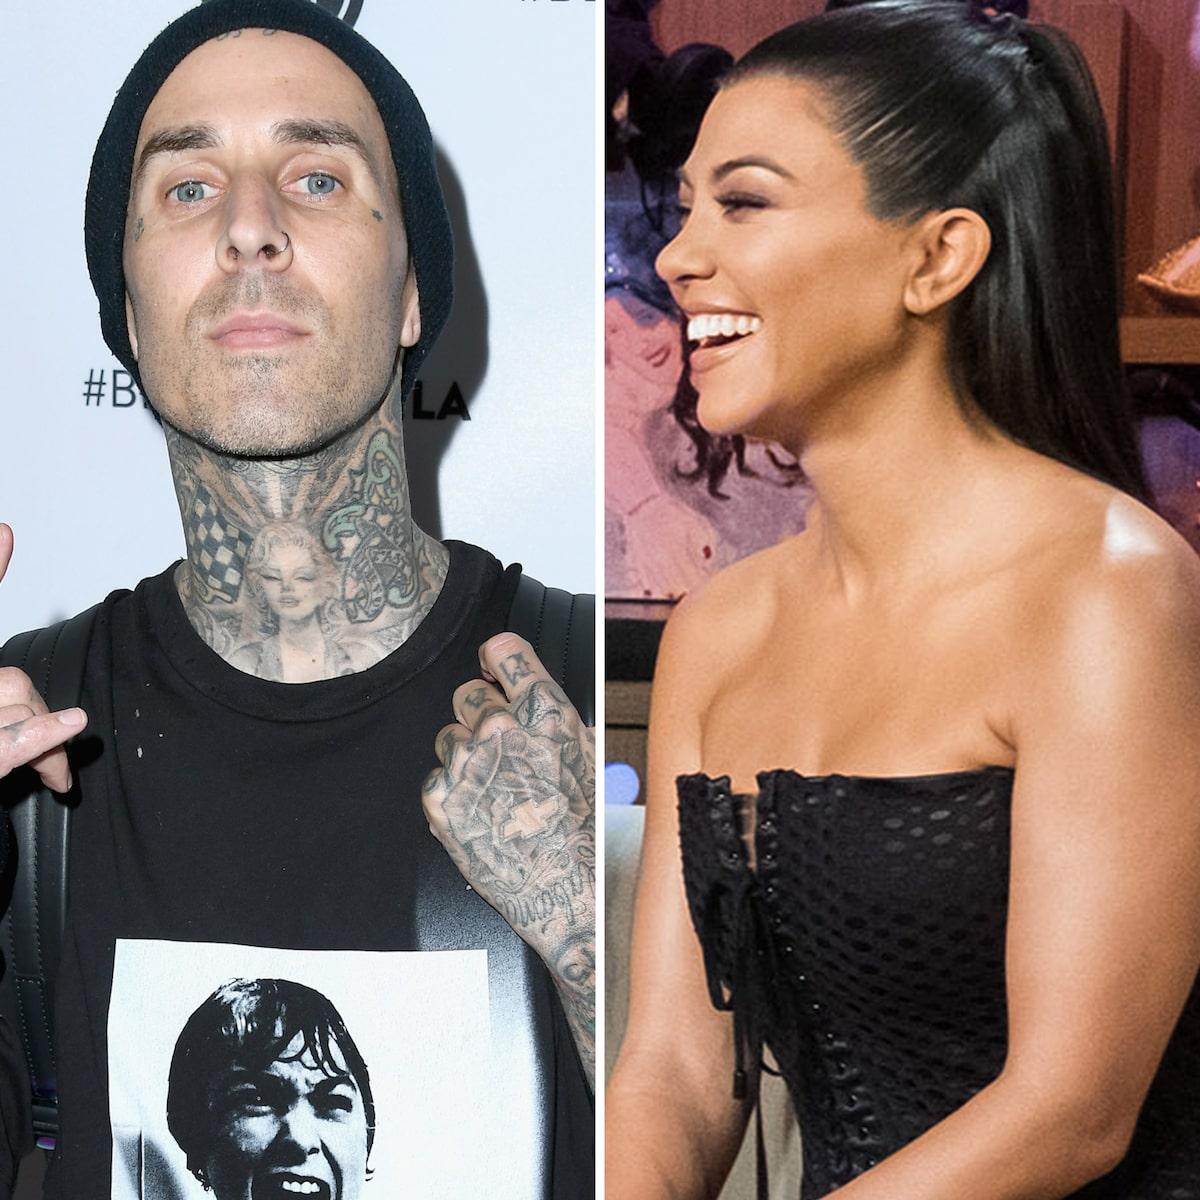 """kuwtk-kourtney-kardashian-reportedly-really-likes-travis-barker-inside-their-relationship"""